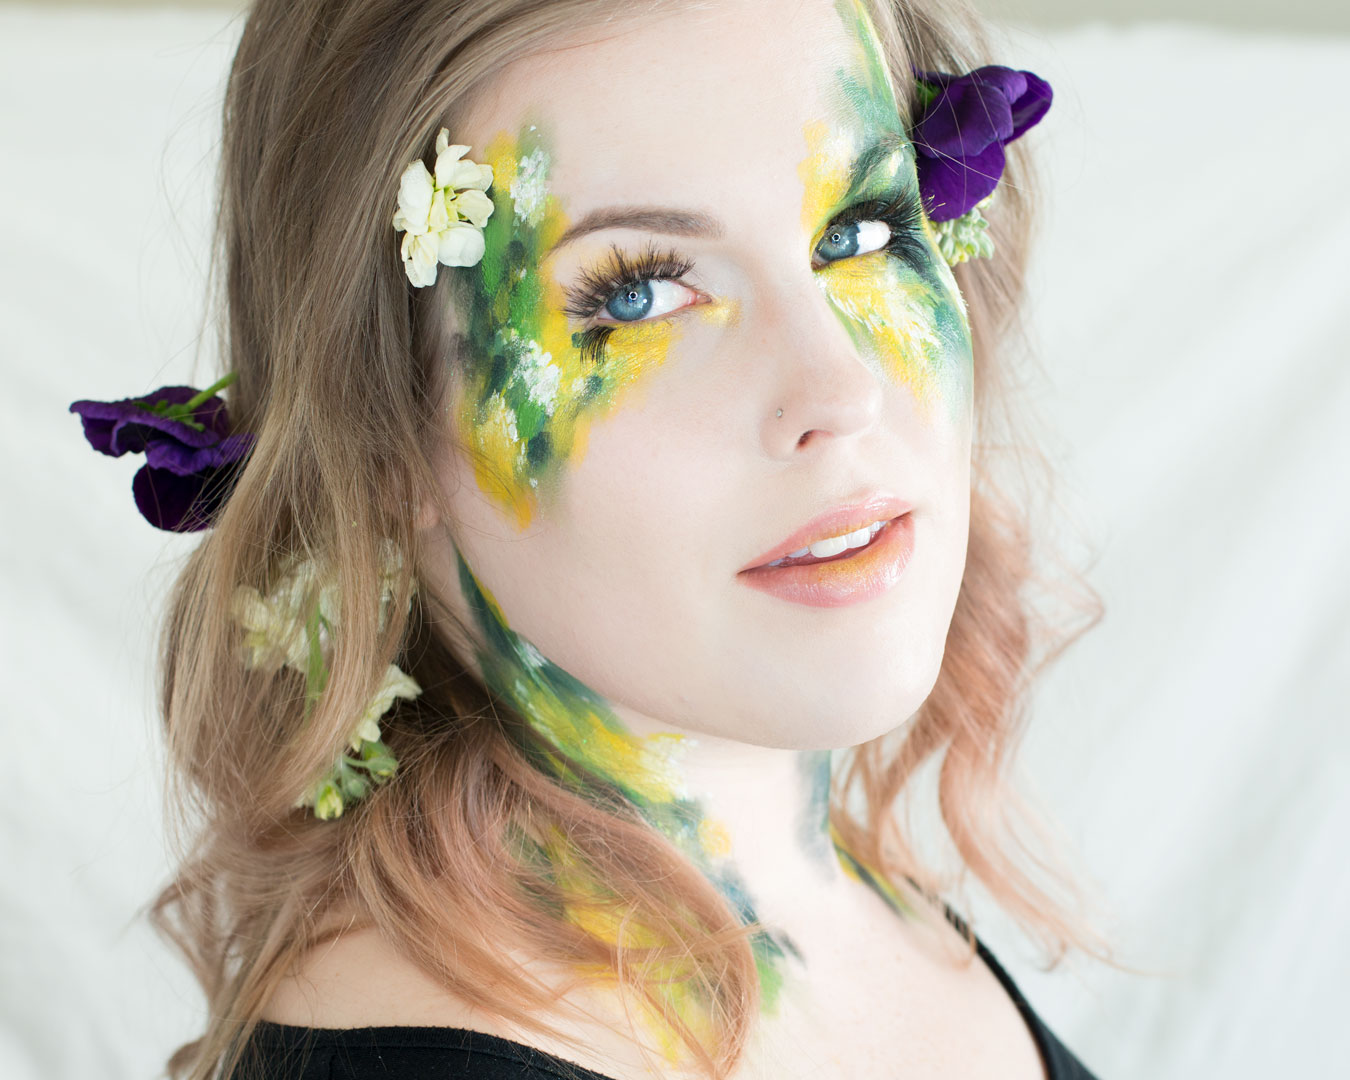 pacific-northwest-inspired-makeup-look.jpg